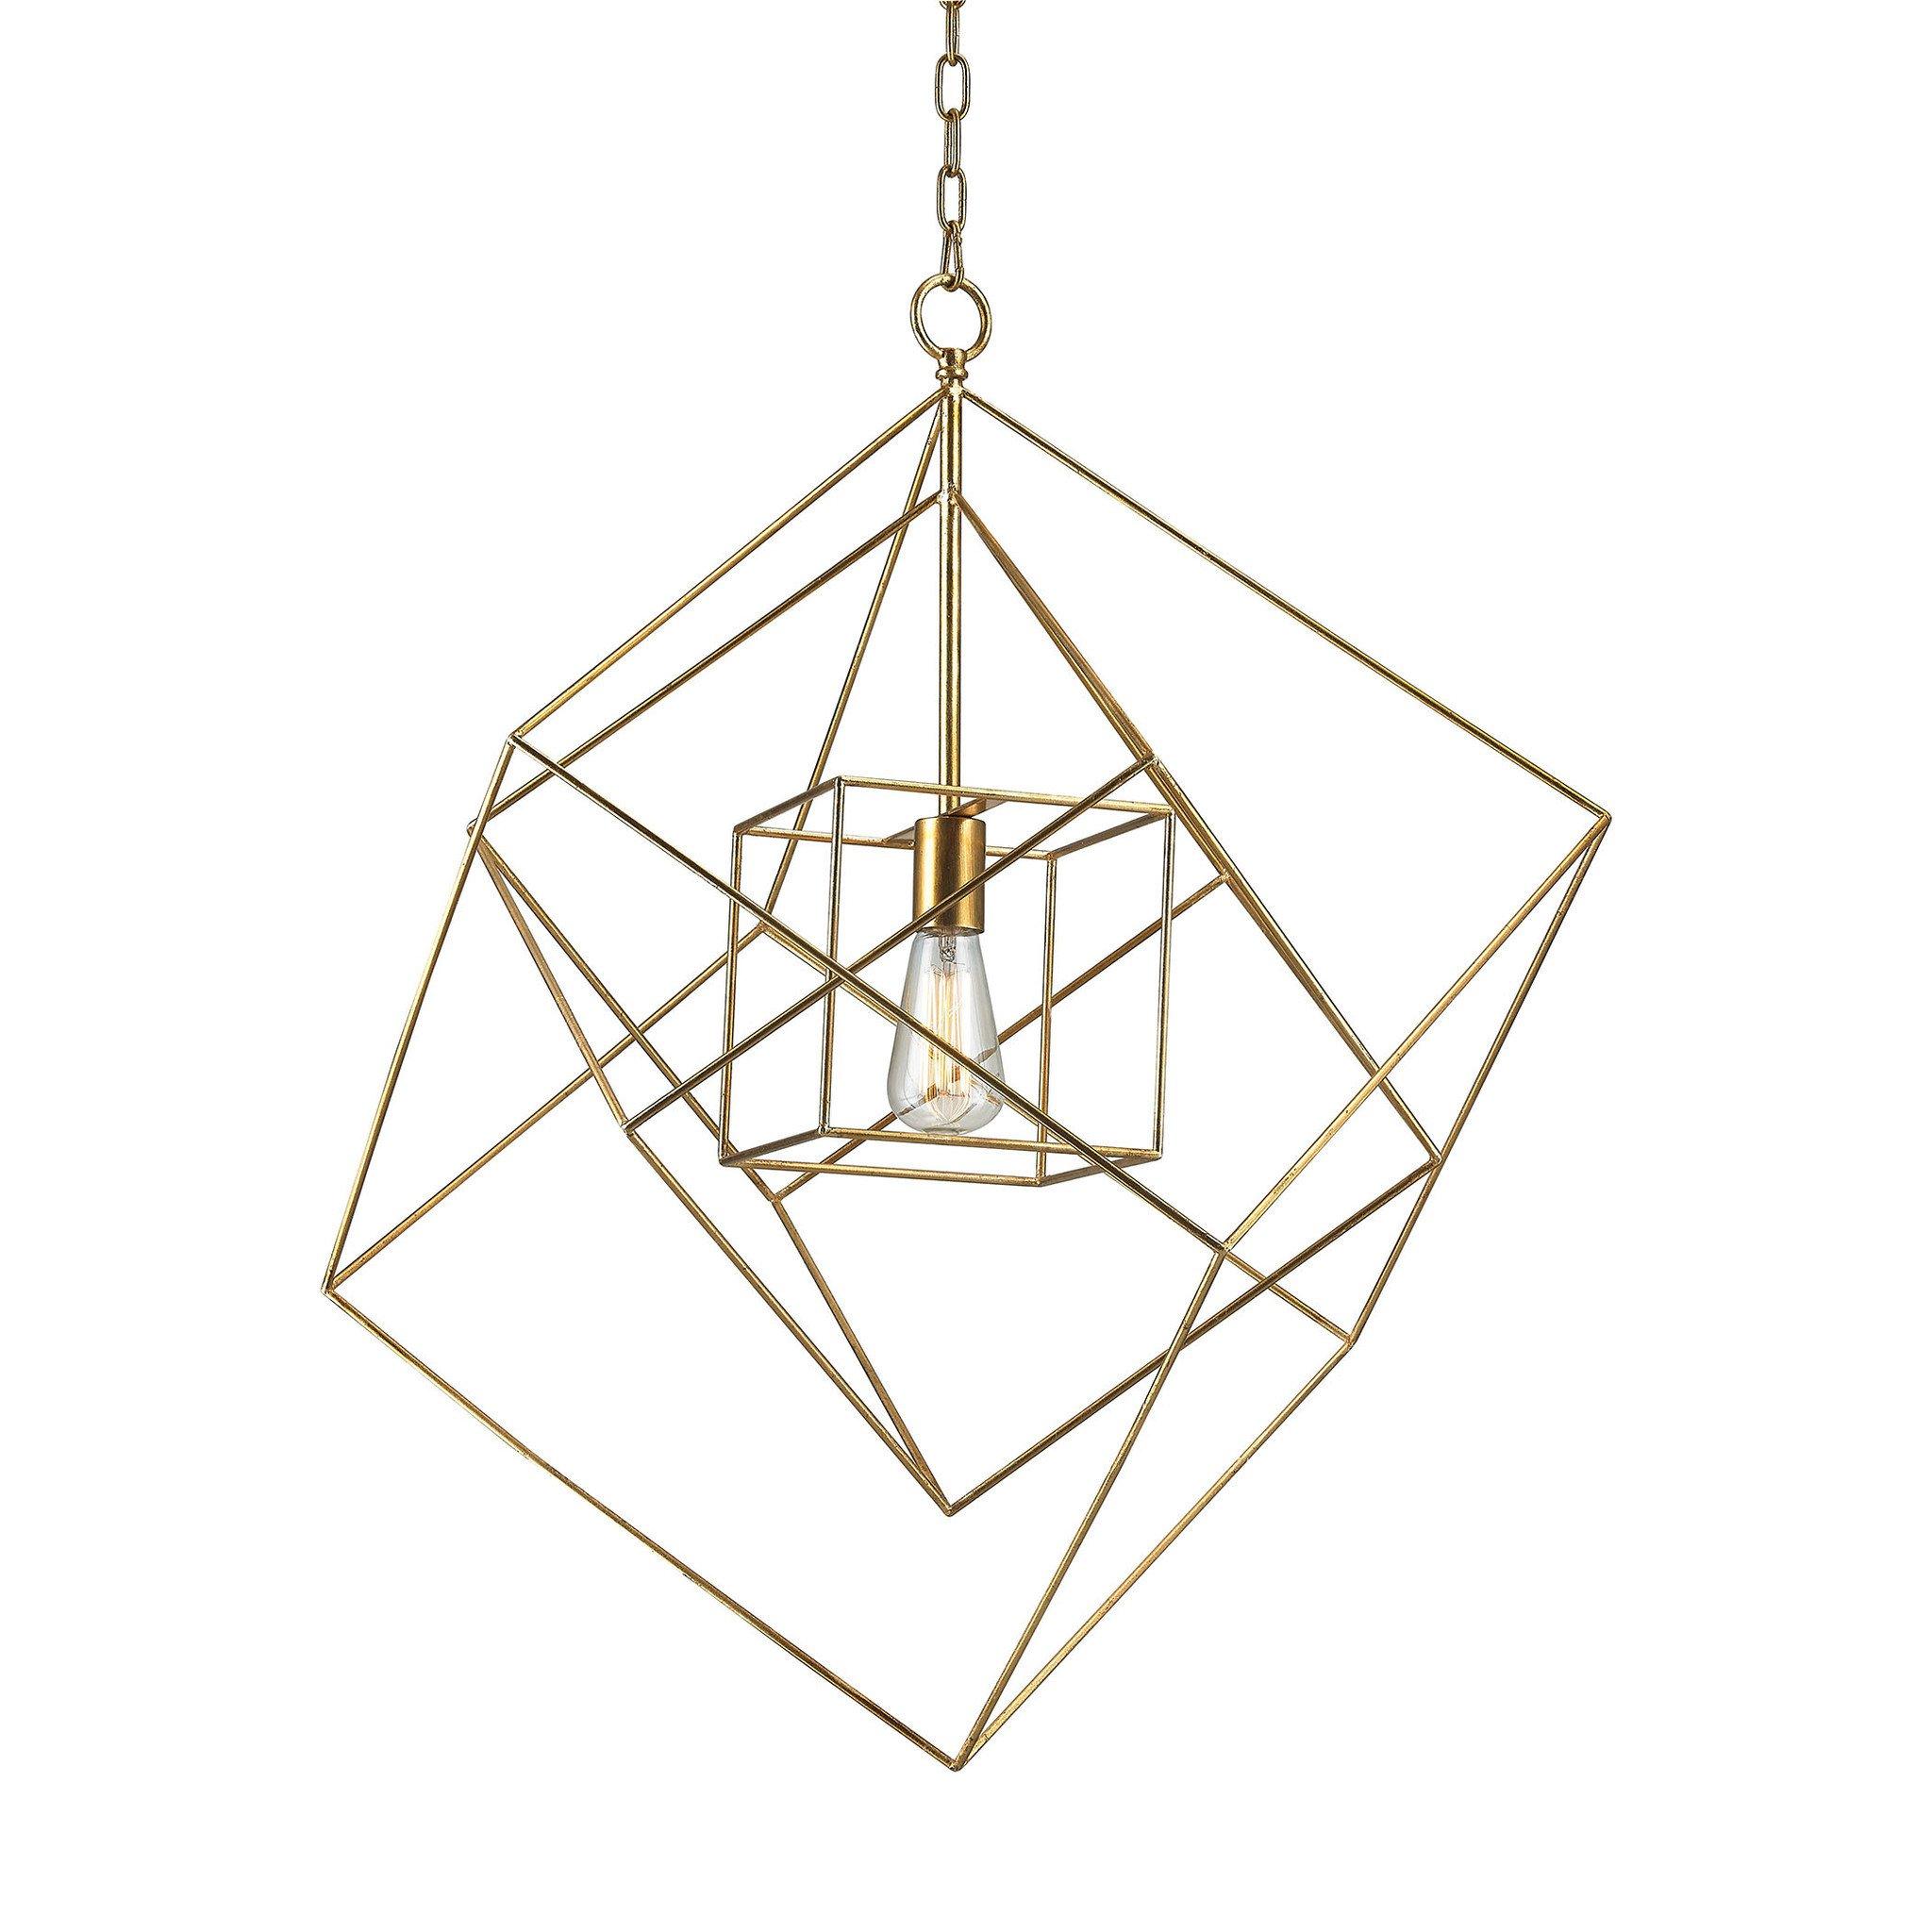 2048x2048 Large Neil 1 Light Box Pendant In Gold Leaf Design By Bd Fine